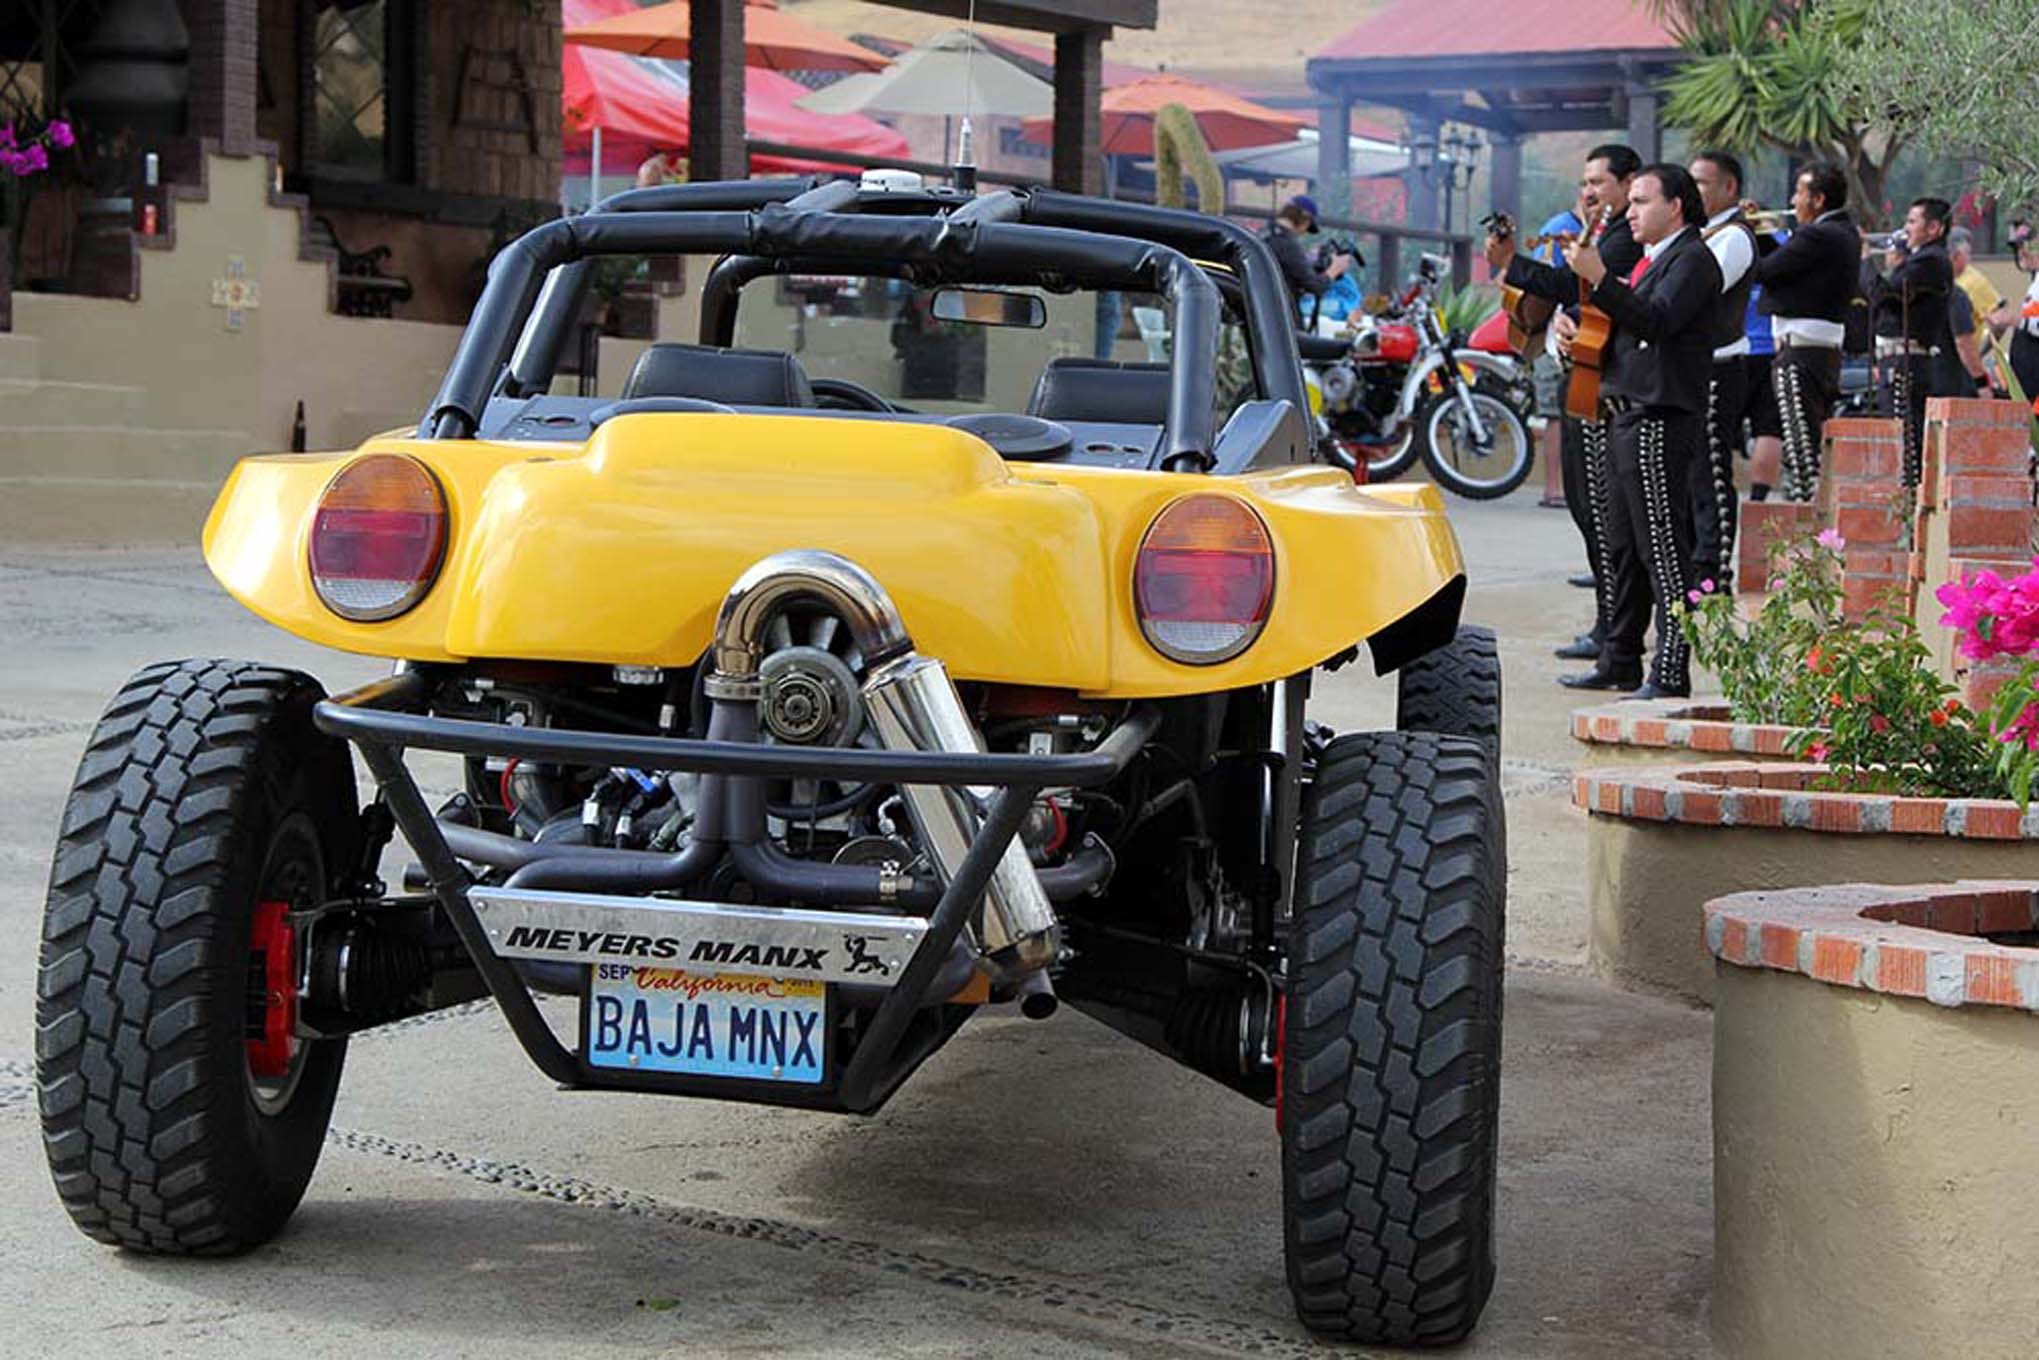 034NORRA Mexican 1000 BAJA offroad Race 2015 Manx Nova Chevy James Garner